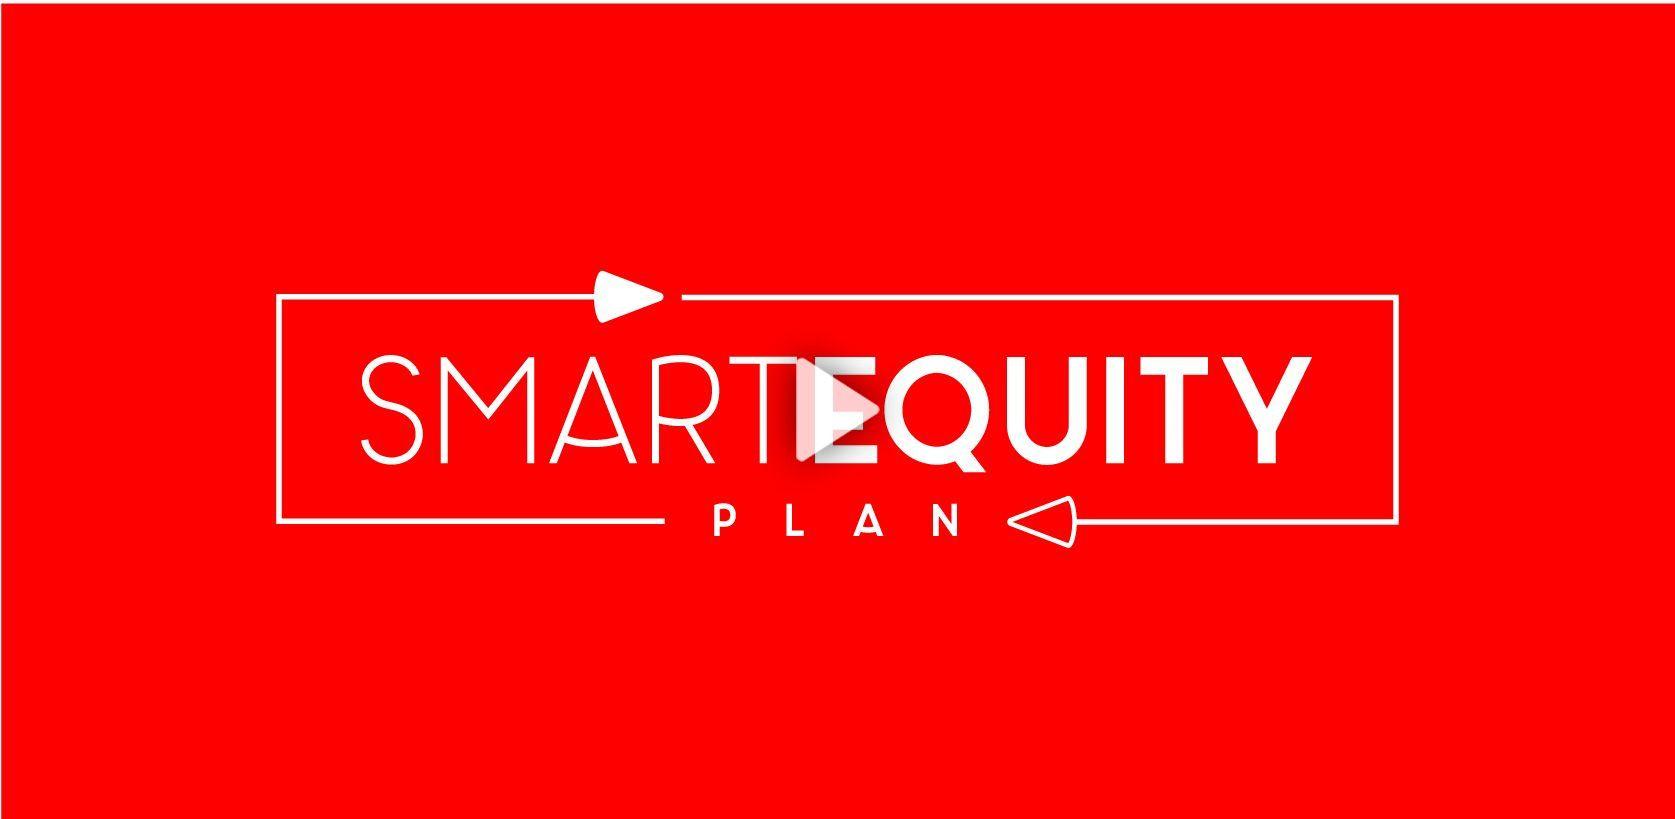 Smart Equity Video